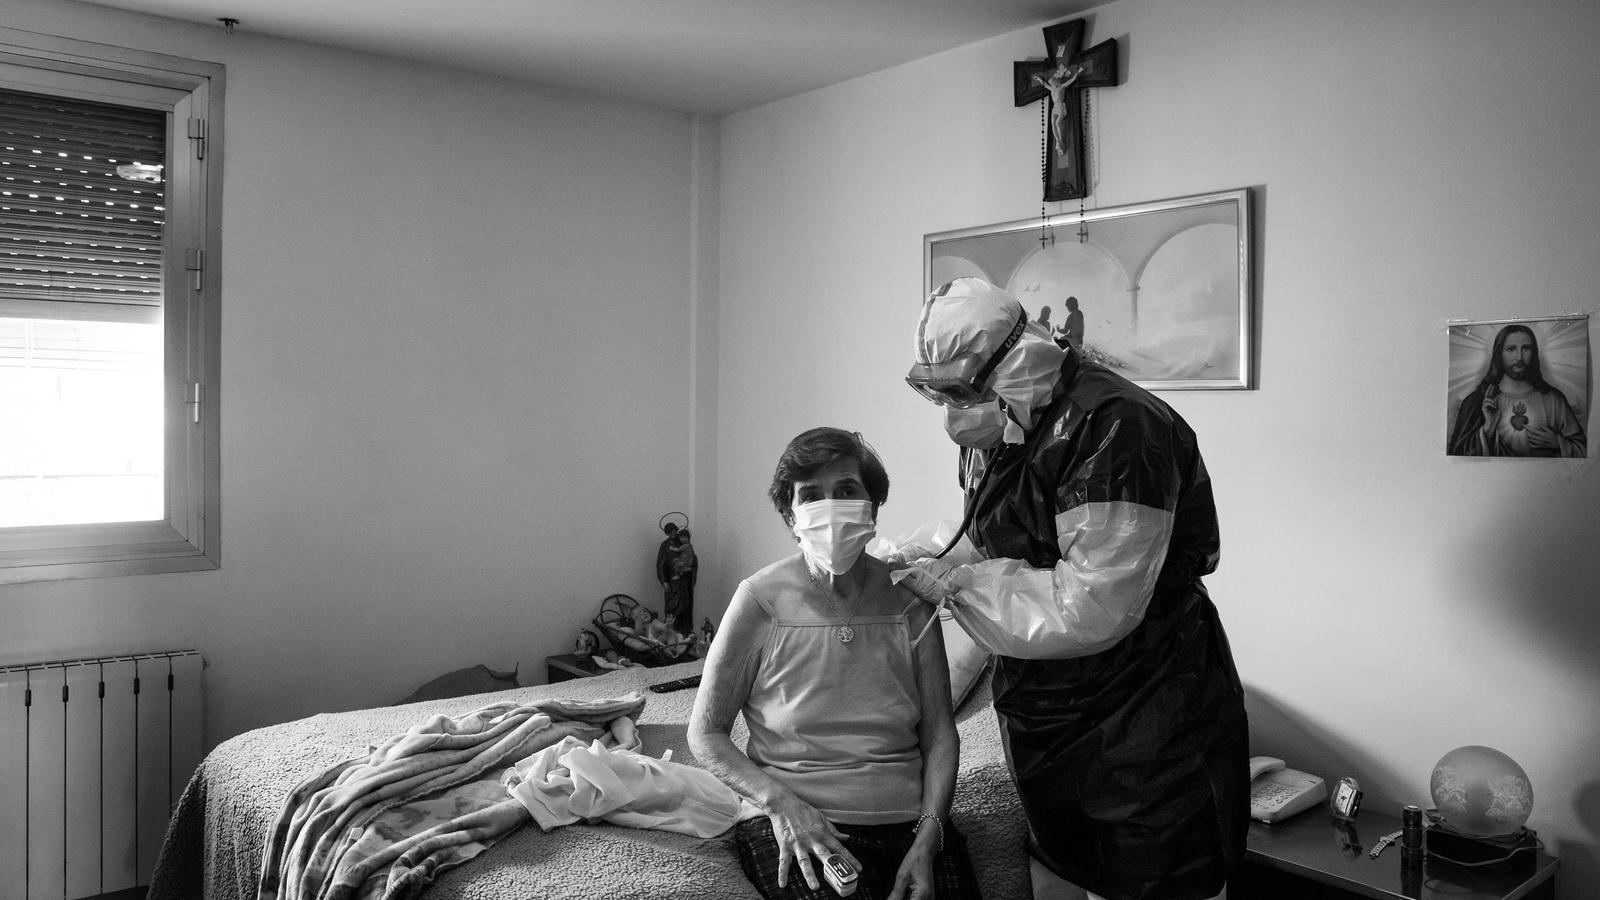 El doctor Rafael Pacheco del CAP de Bellvitge fent visita a domicili a la Carmen, possible contagiada, durant la pandemia del coronavirus,